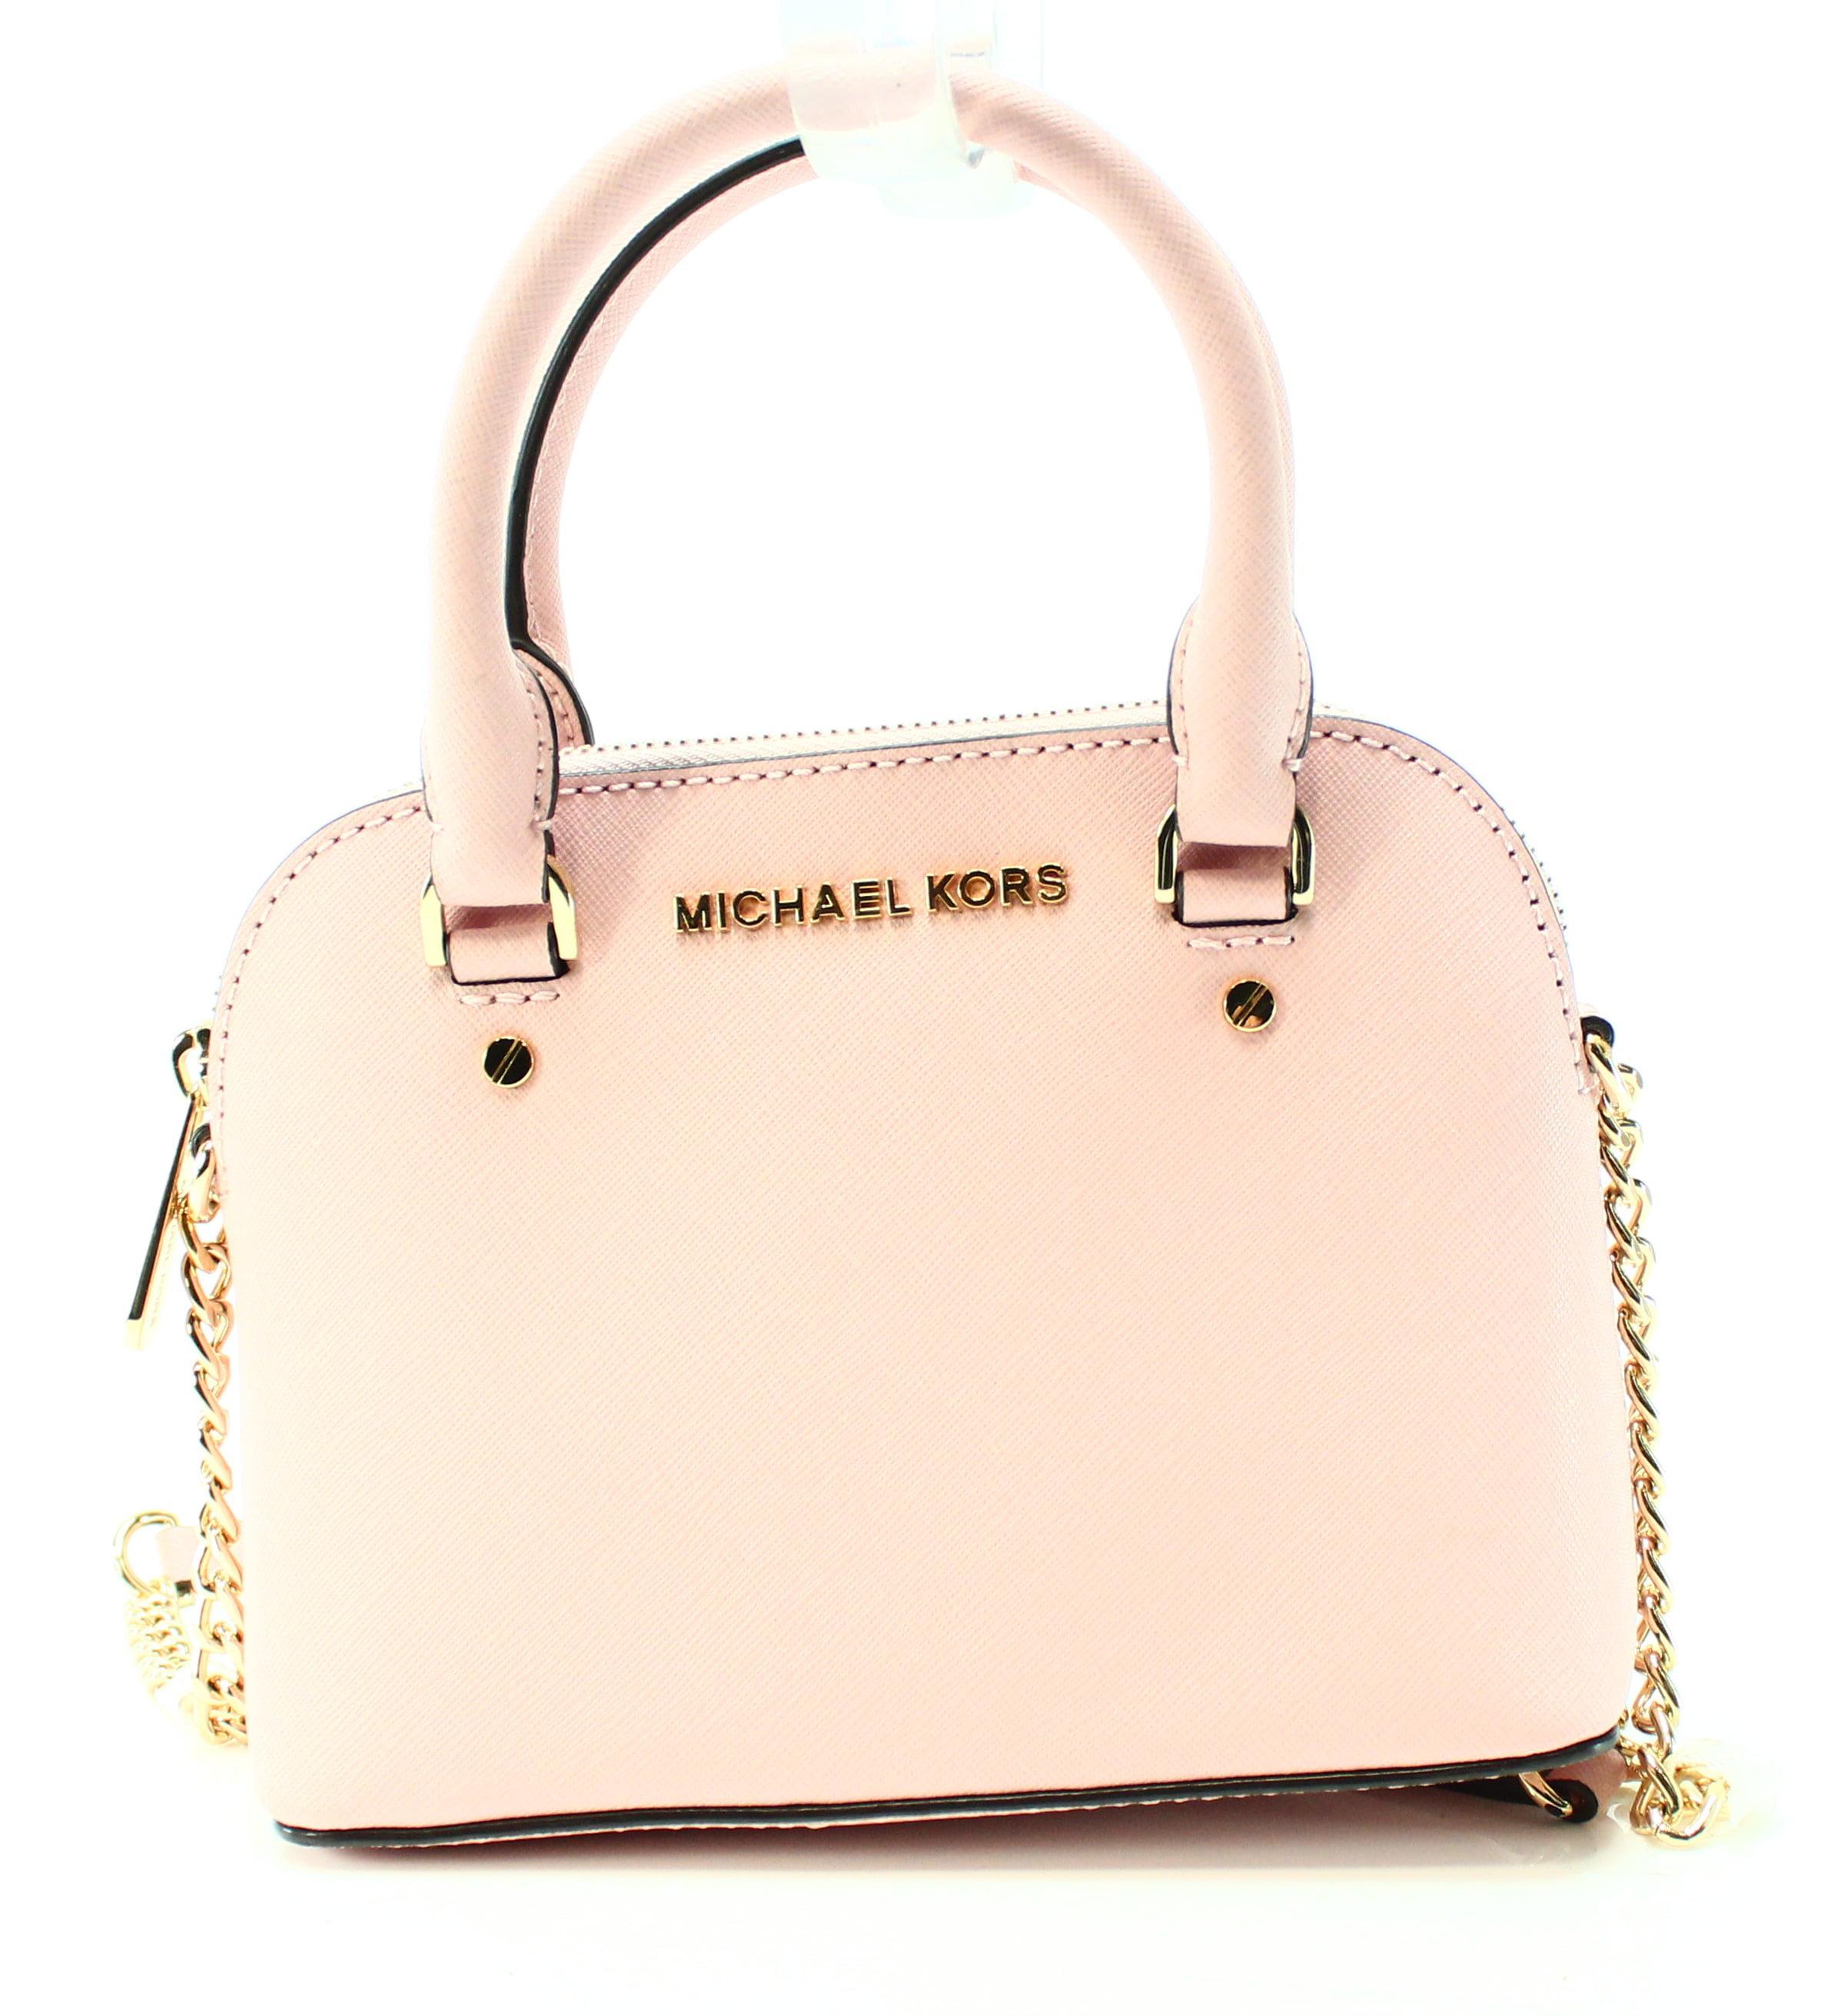 4fdbaa021e6e ... inexpensive michael kors new pastel pink saffiano cindy mini crossbody  bag purse walmart 75ddb b844c